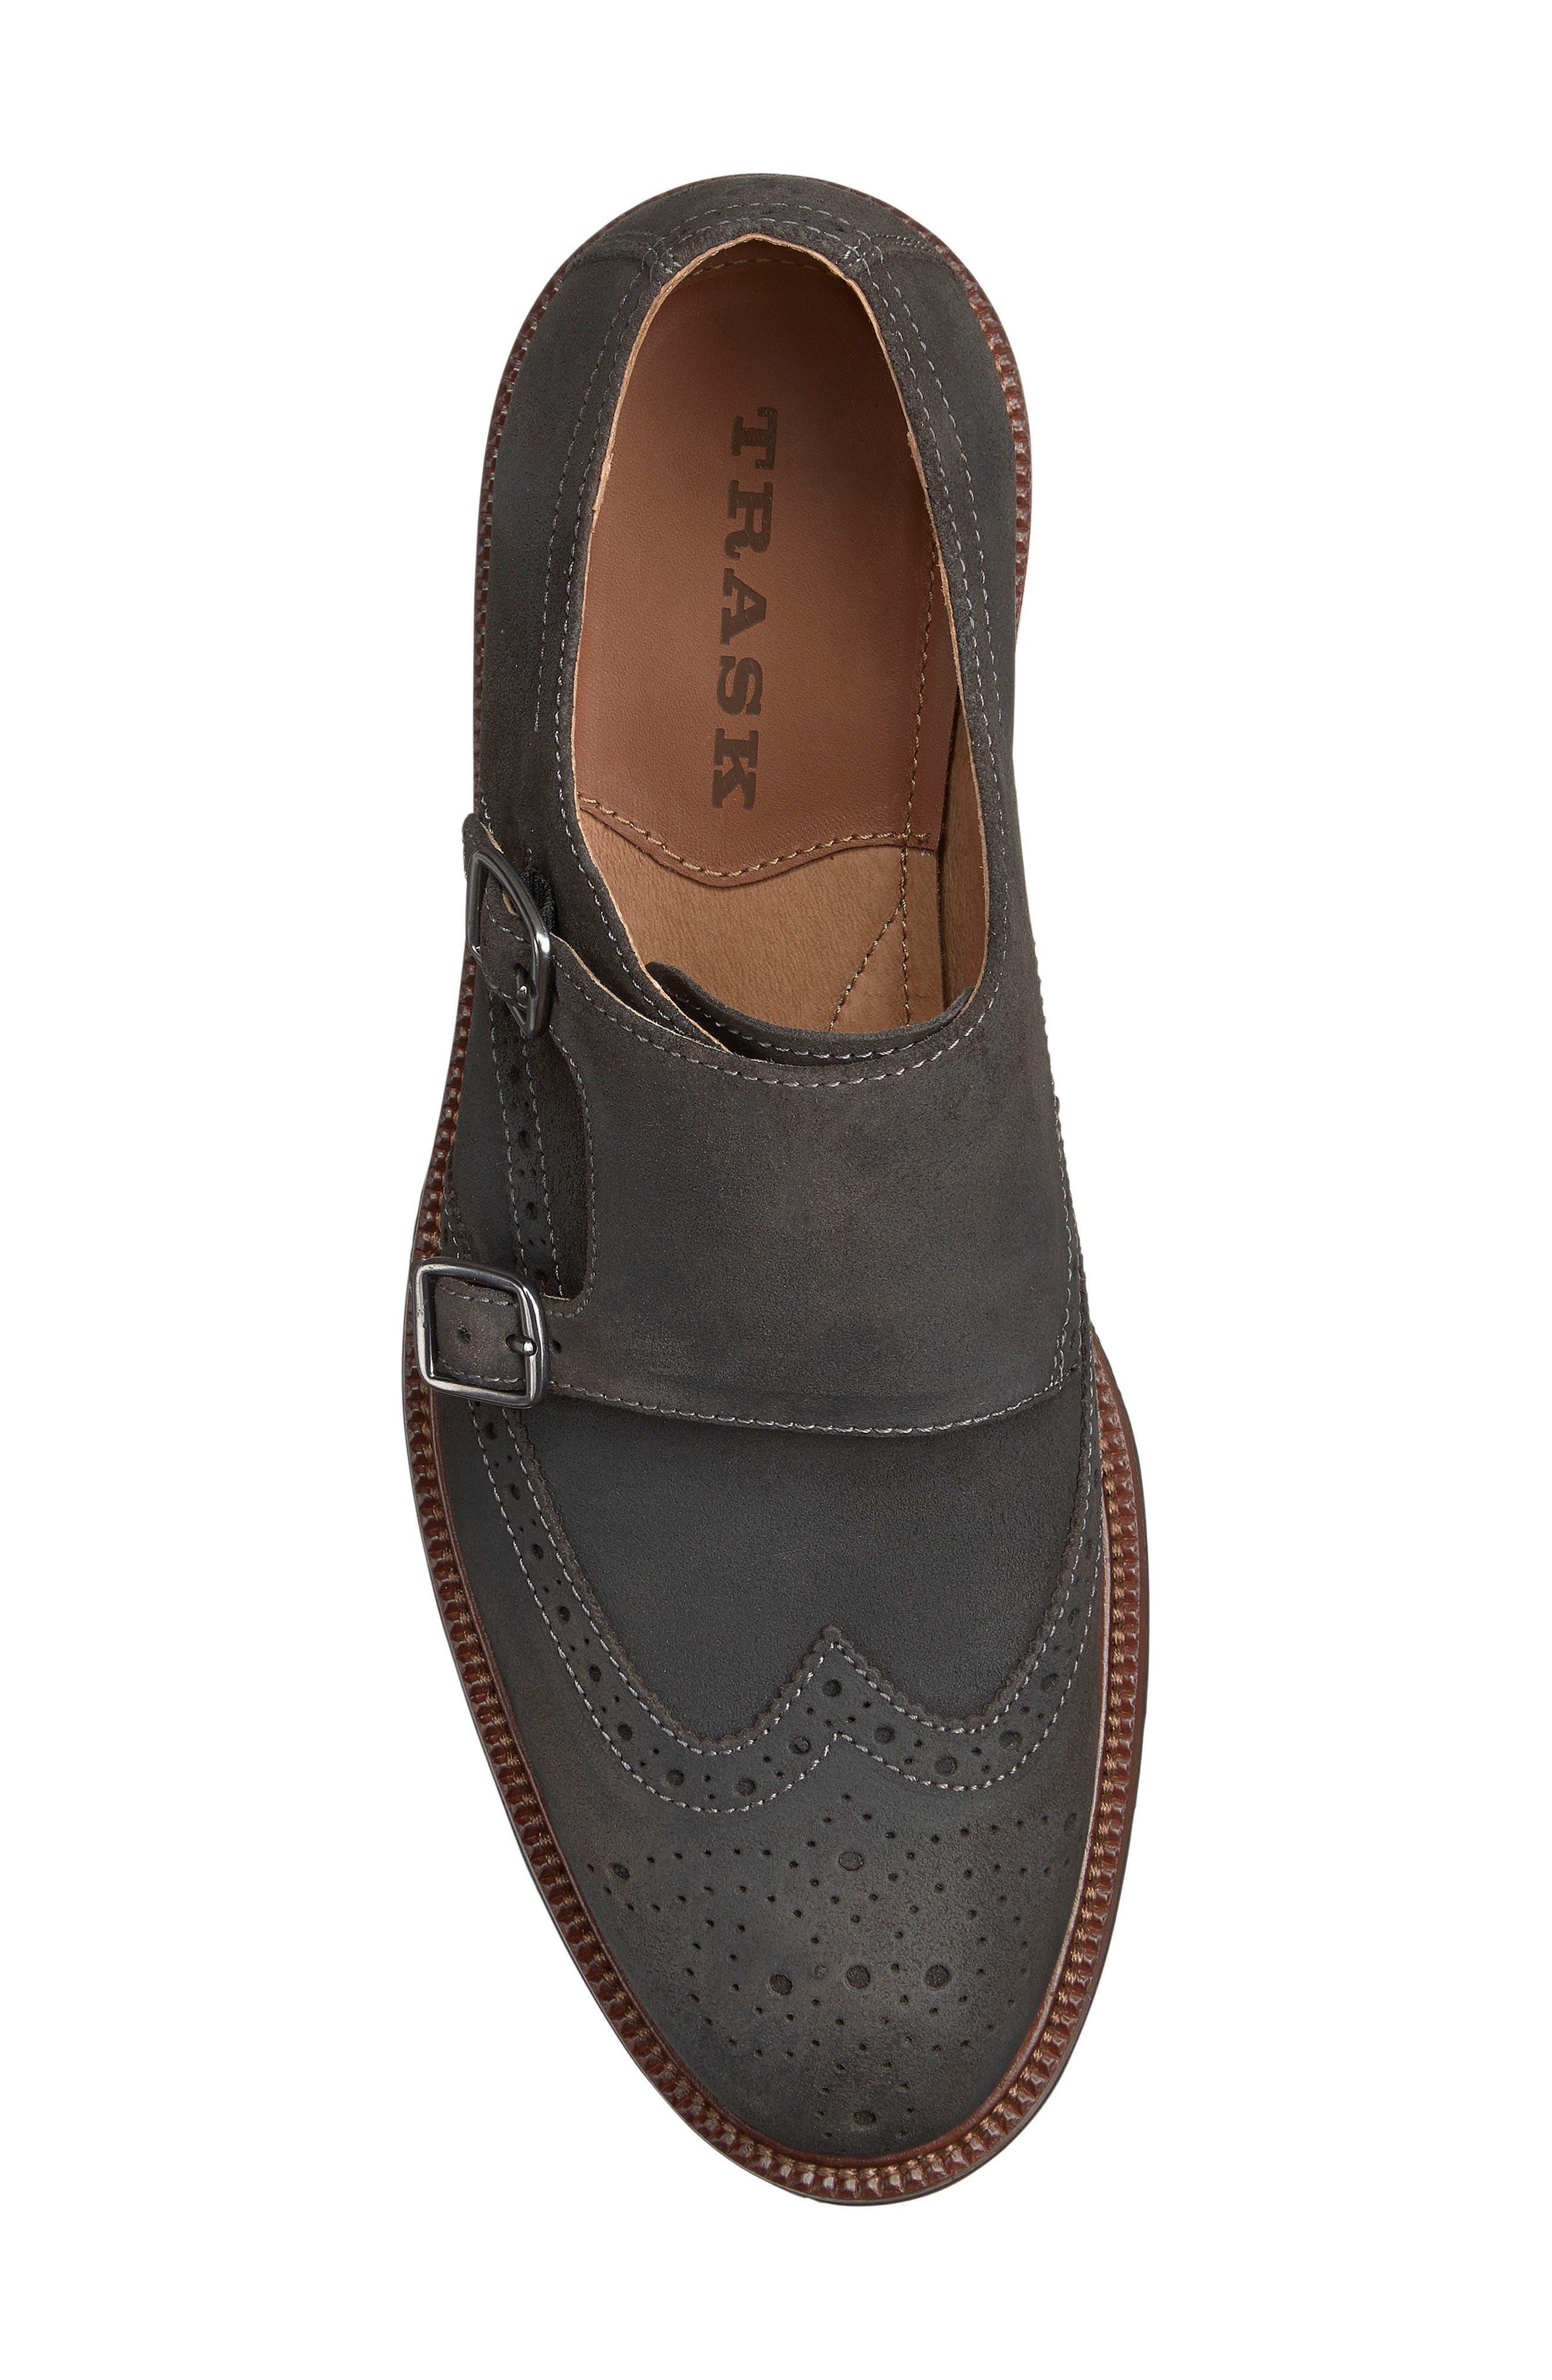 Leland Double Monk Strap Shoe,                             Alternate thumbnail 3, color,                             GRAY WAXED SUEDE